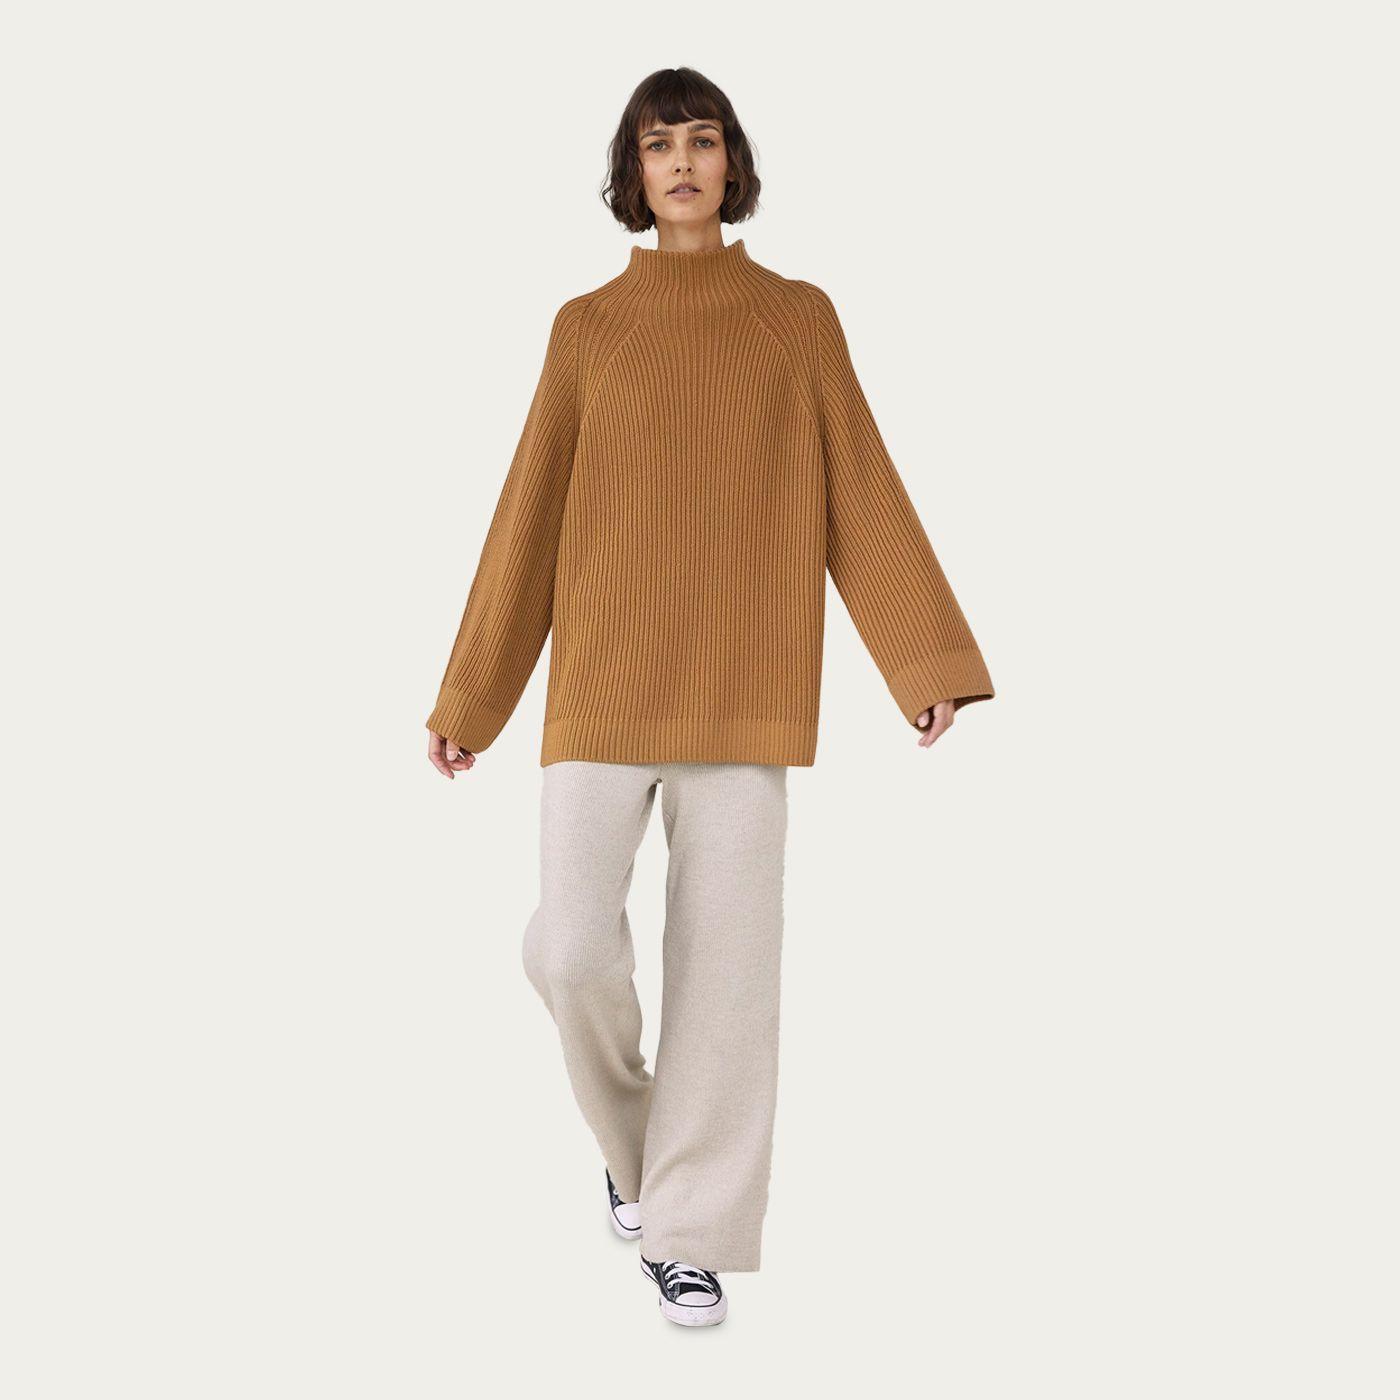 Camel Sweater/ Pearl Pants Milda Mix & Match Loungewear Set   Bombinate